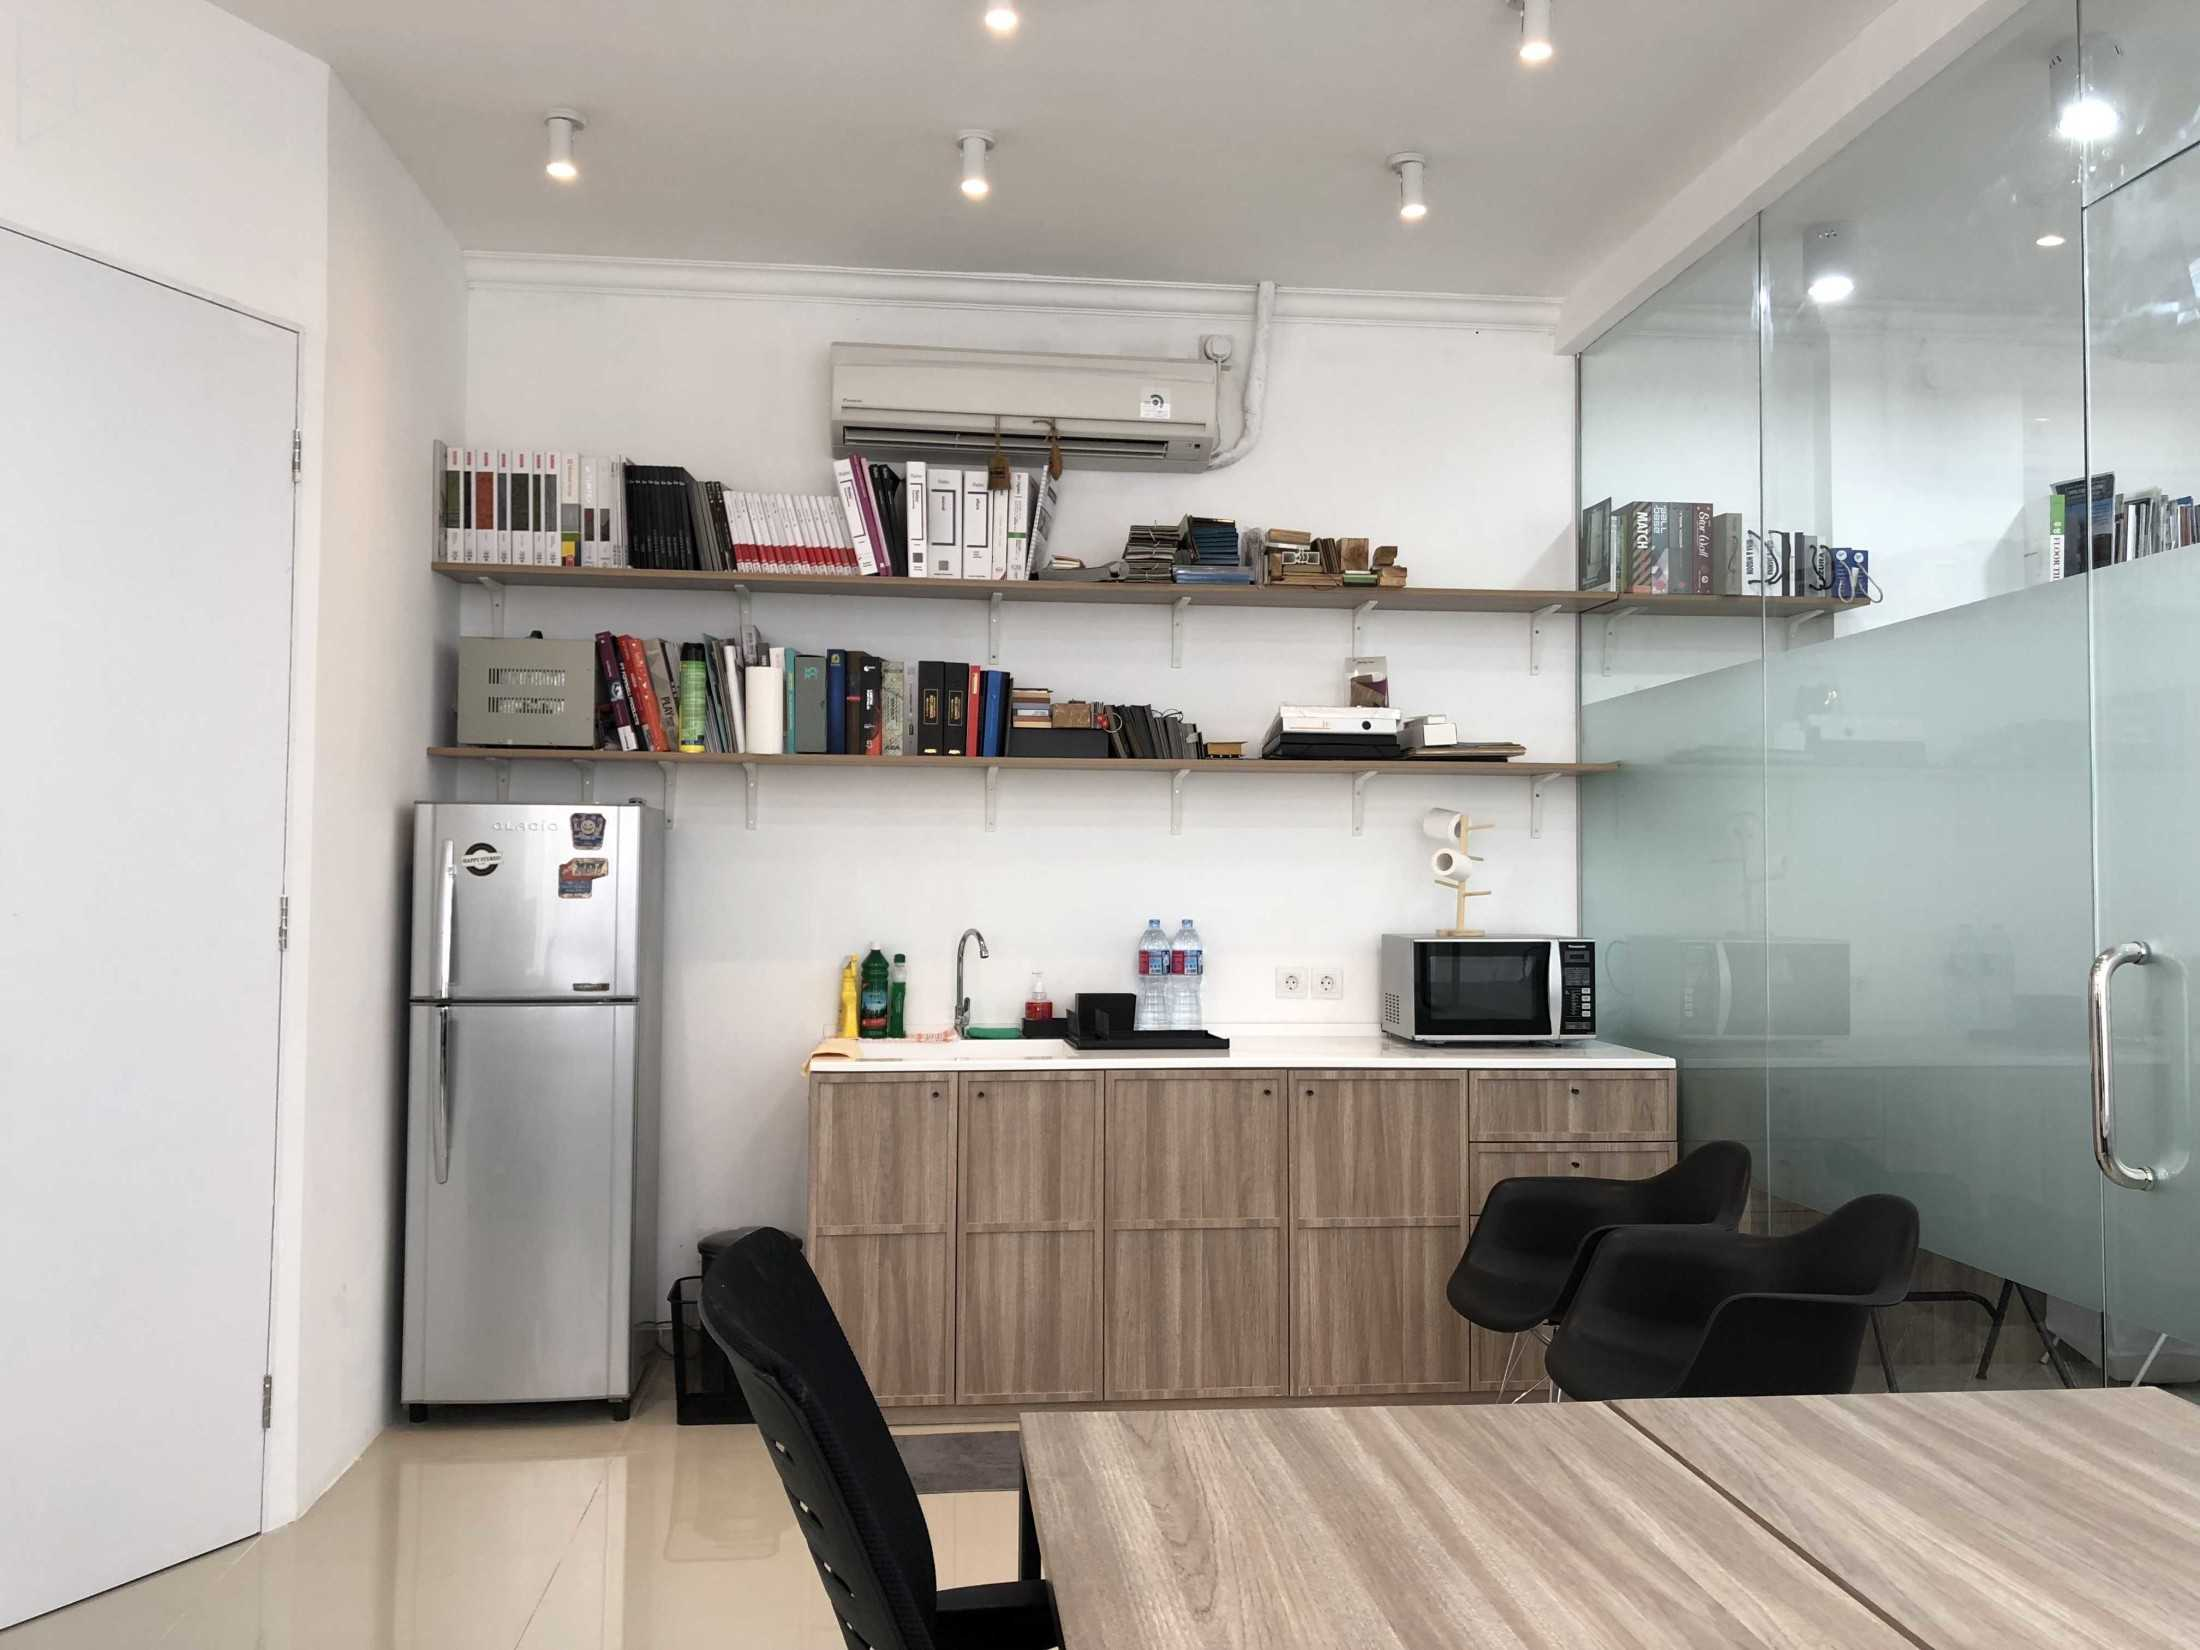 Ties Design & Build Ts Office Jl. Green Lake City Boulevard, Petir, Cipondoh, Kota Tangerang, Banten, Indonesia Jl. Green Lake City Boulevard, Petir, Cipondoh, Kota Tangerang, Banten, Indonesia Pantry  68667